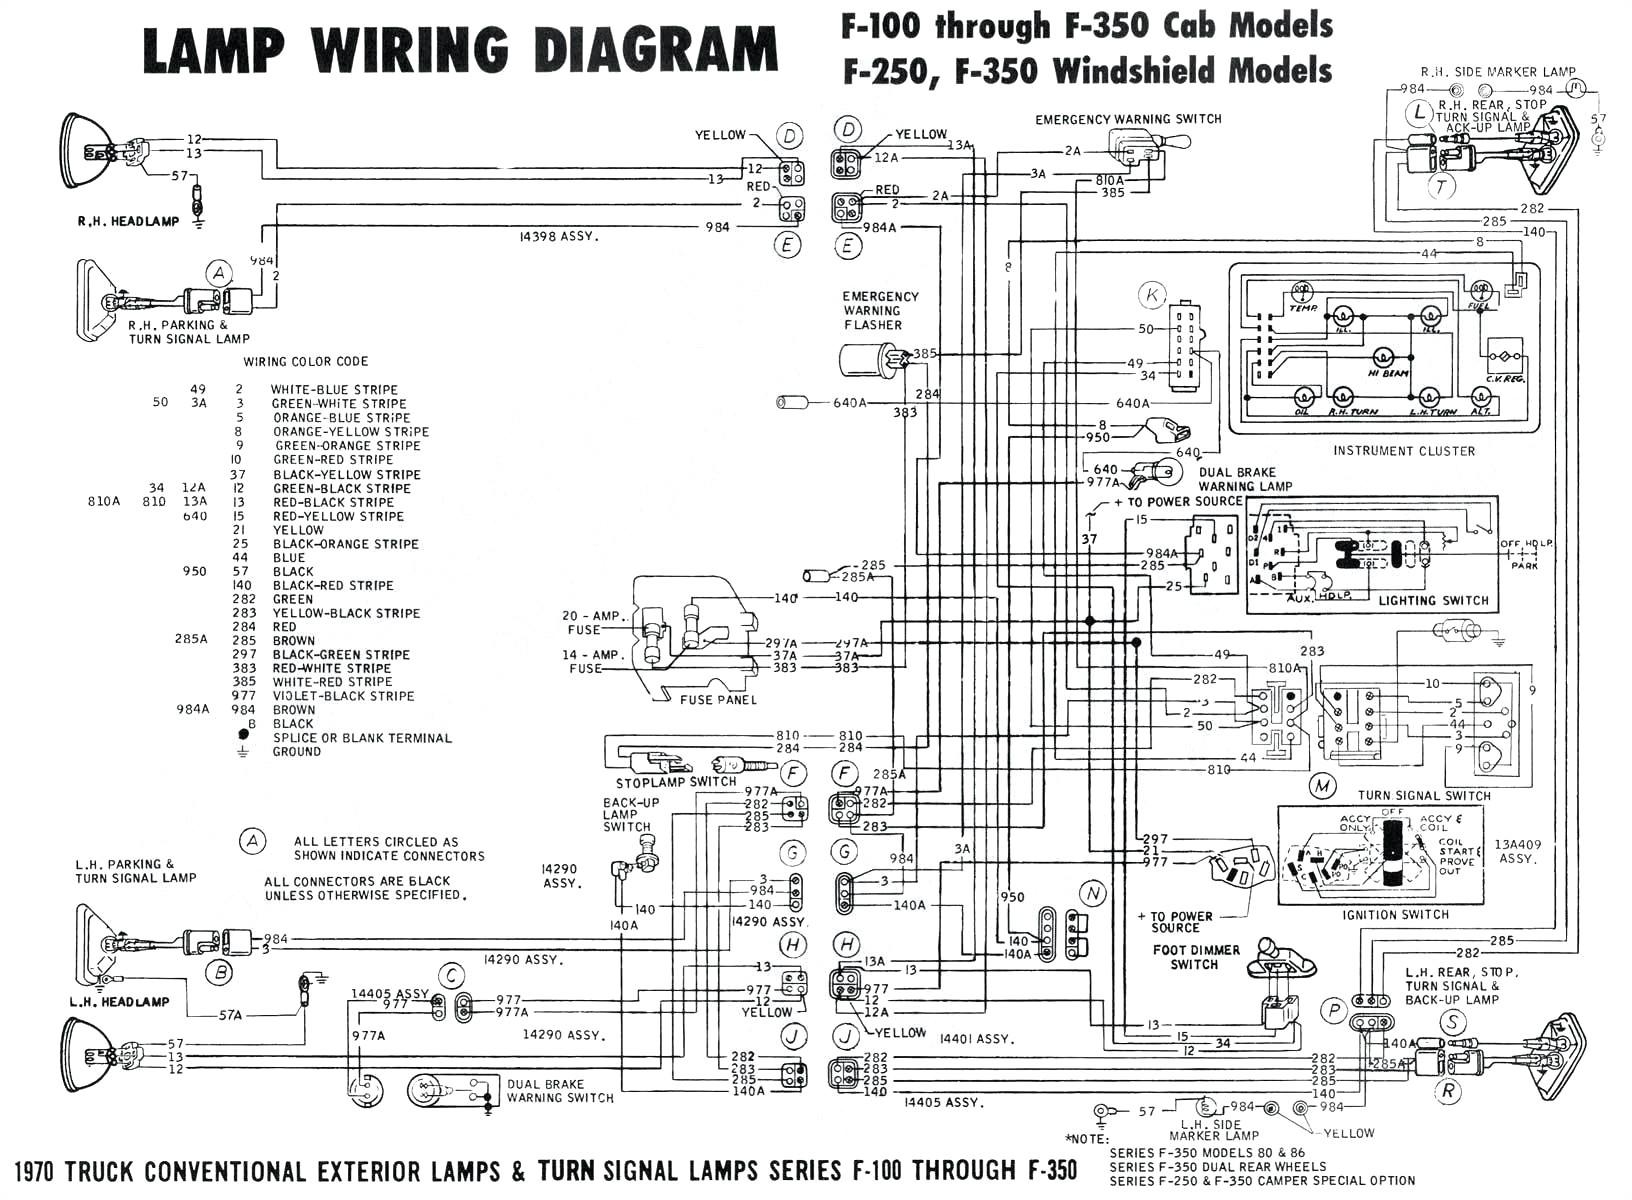 1999 jeep grand cherokee wiring diagram download wiring diagramwiring diagram 1999 ford taurus bcm get free